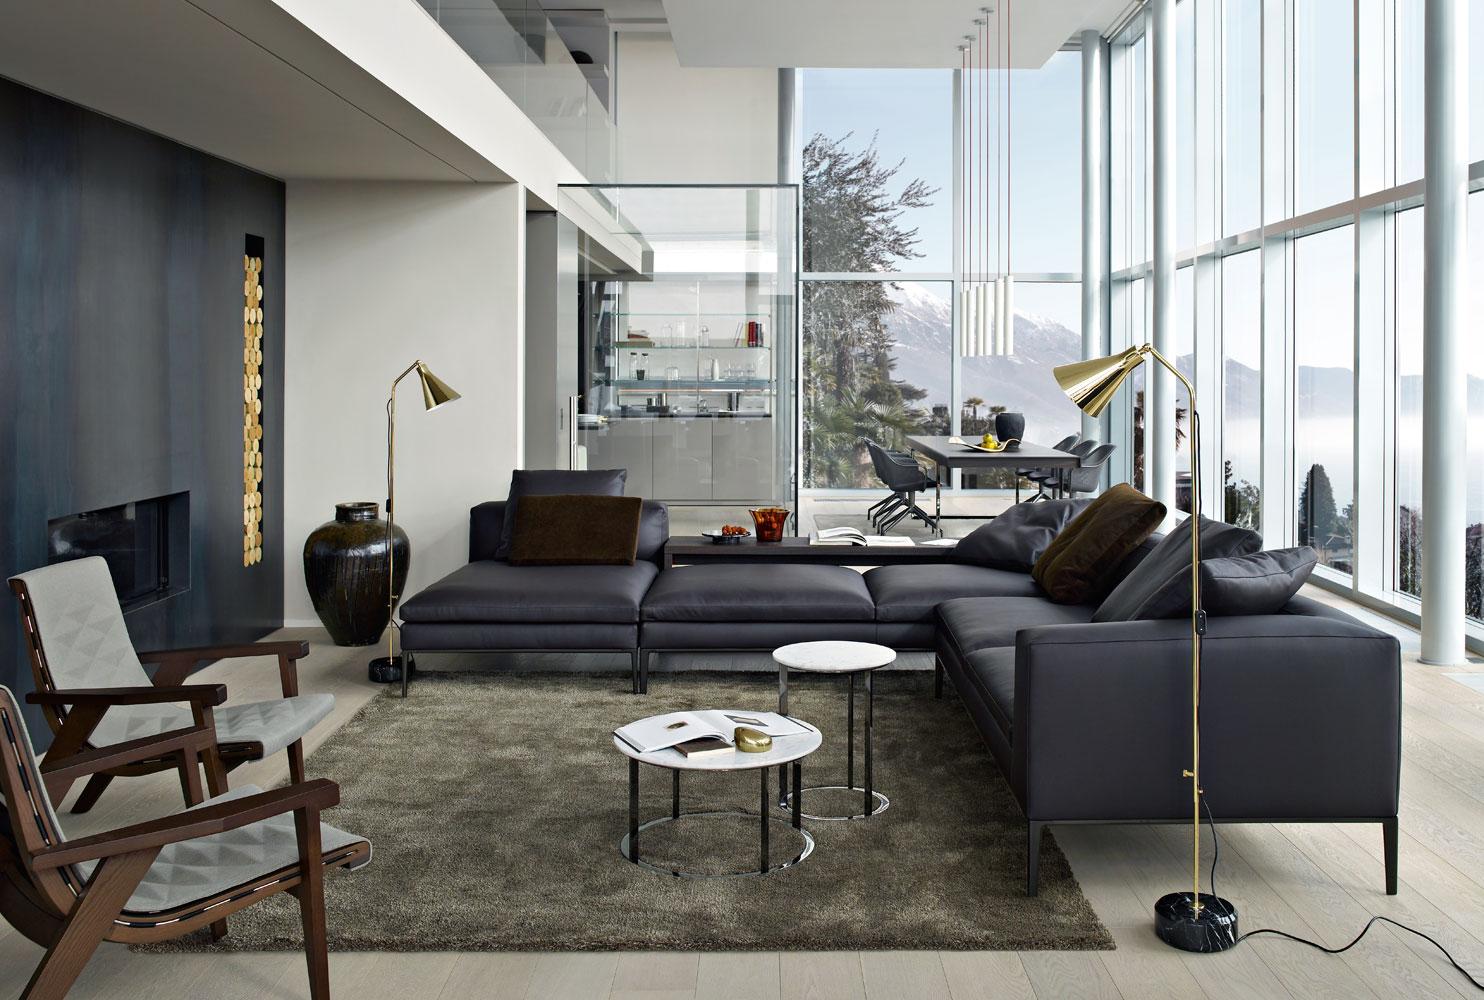 Salón moderno con sofá Michel de Antonio Citterio para B&B Italia